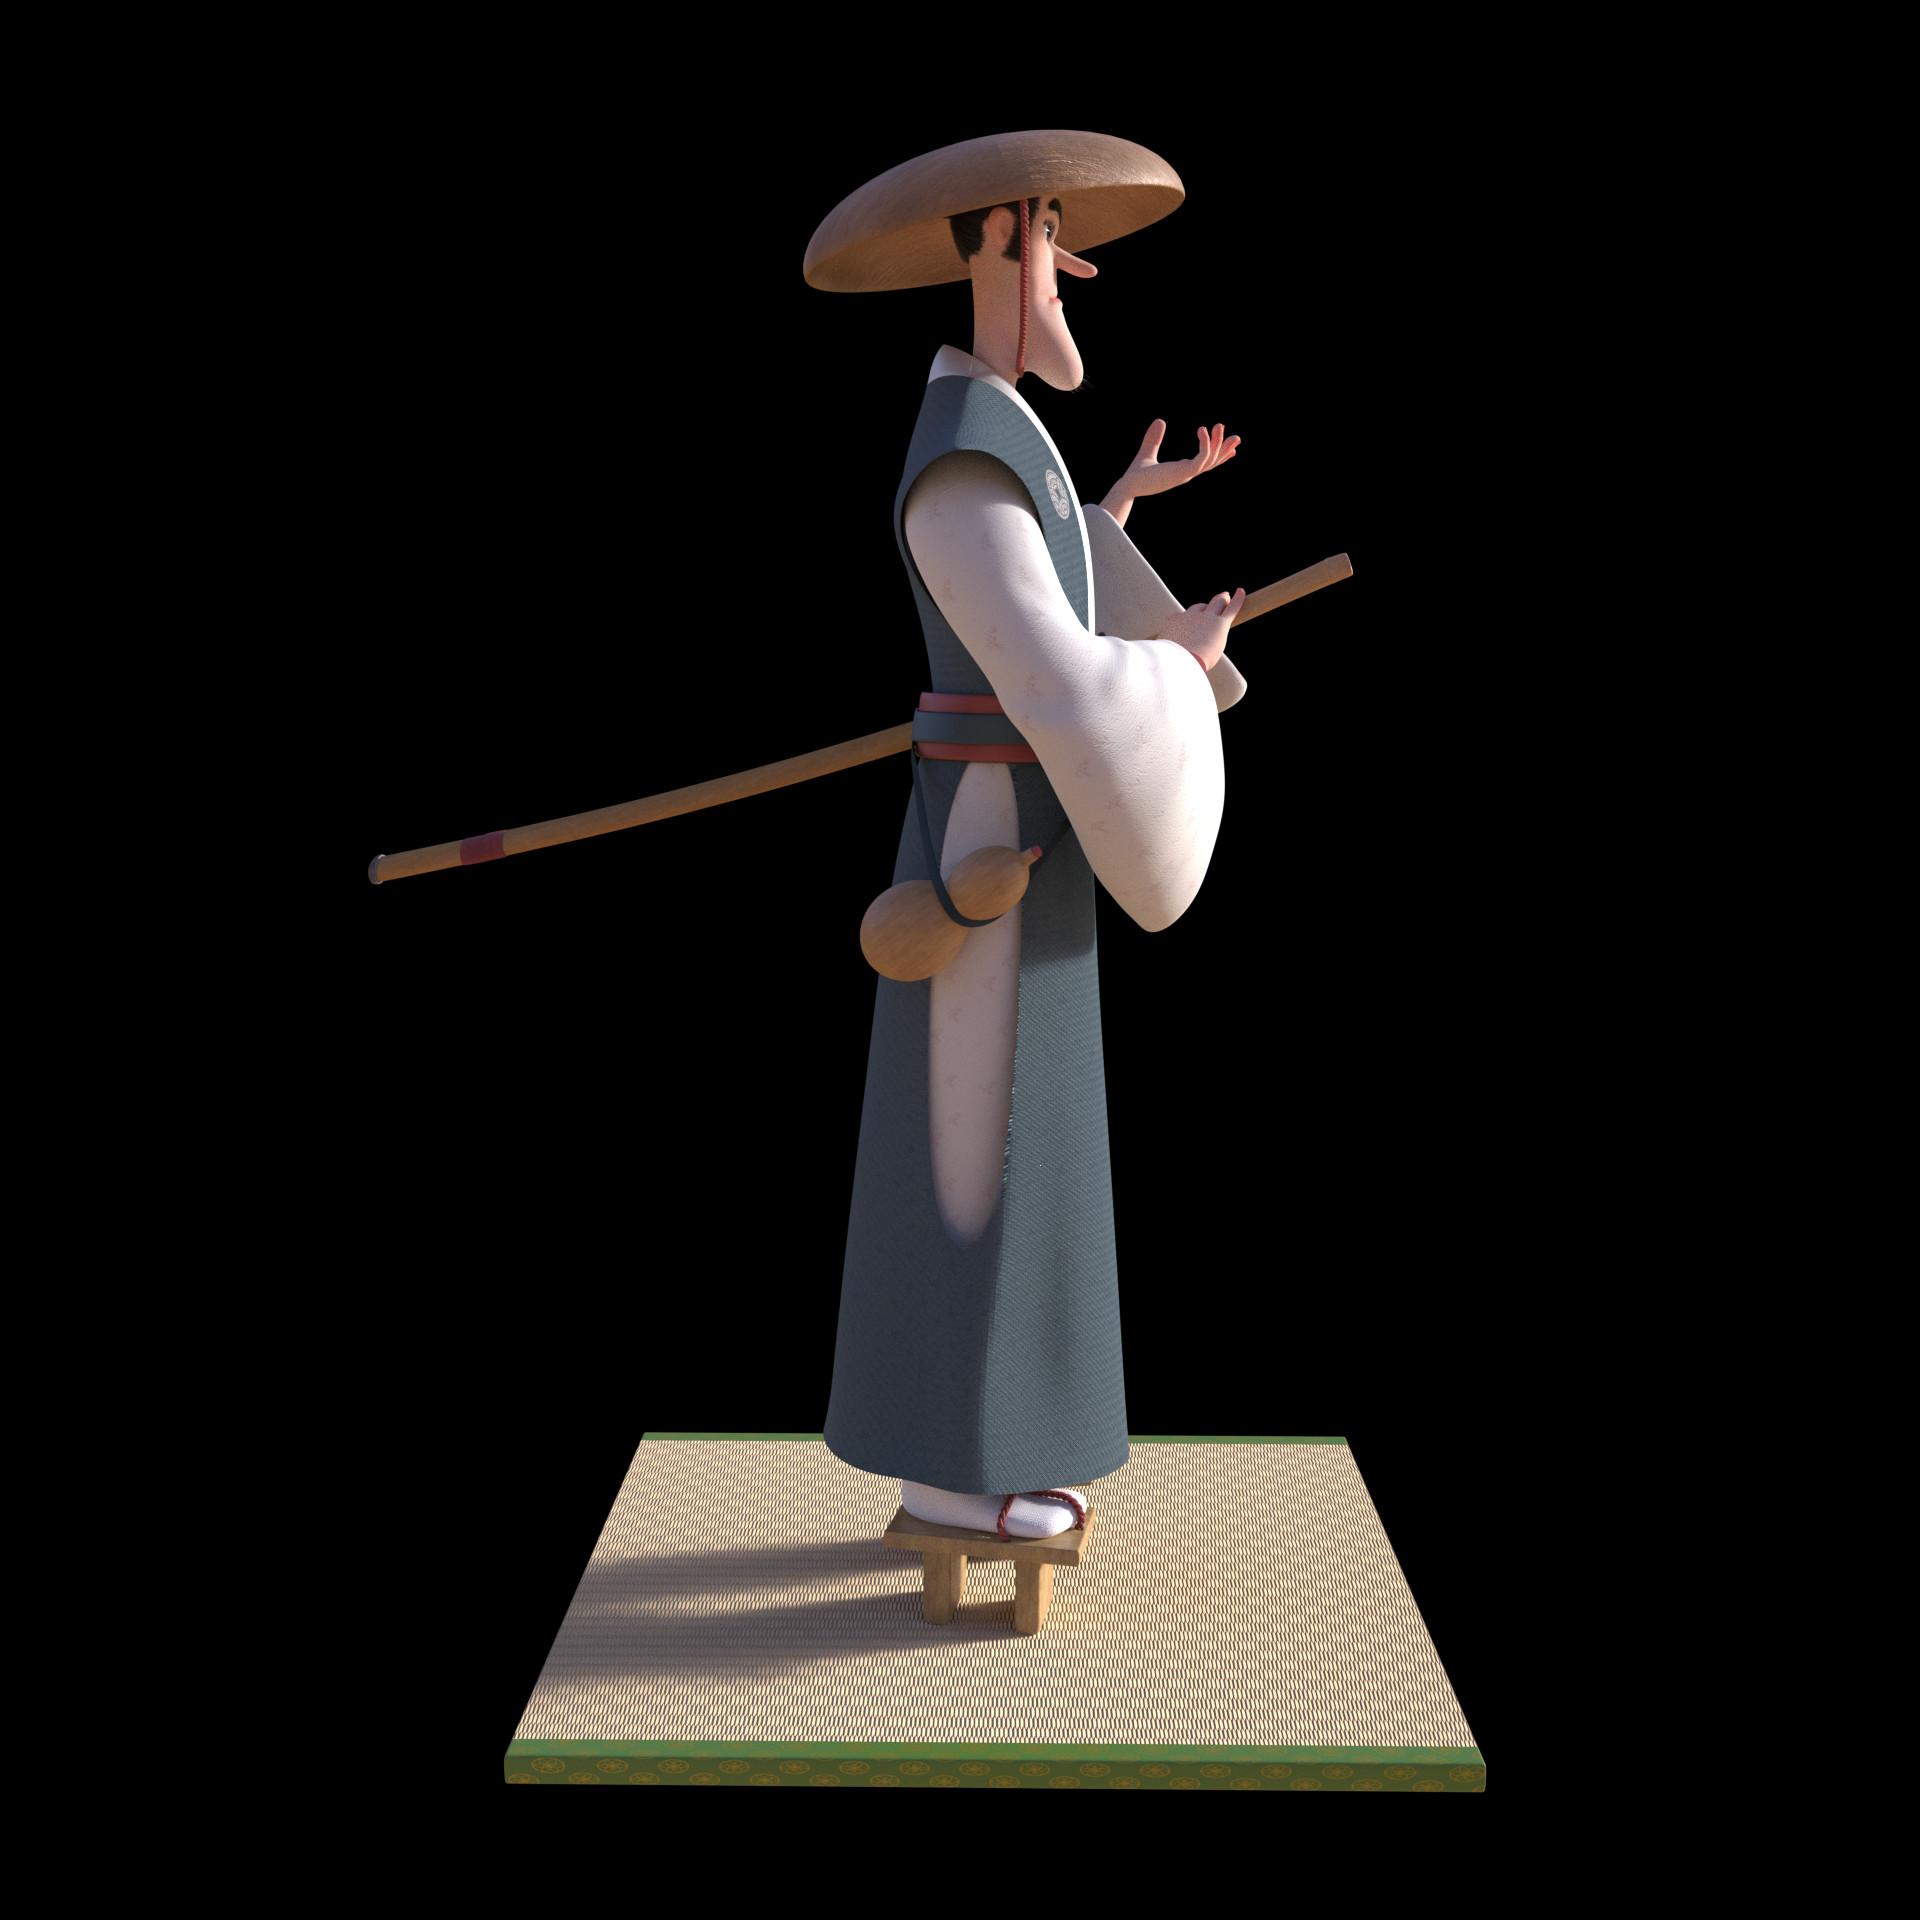 Daniel ajagbe soaked samurai beauty left